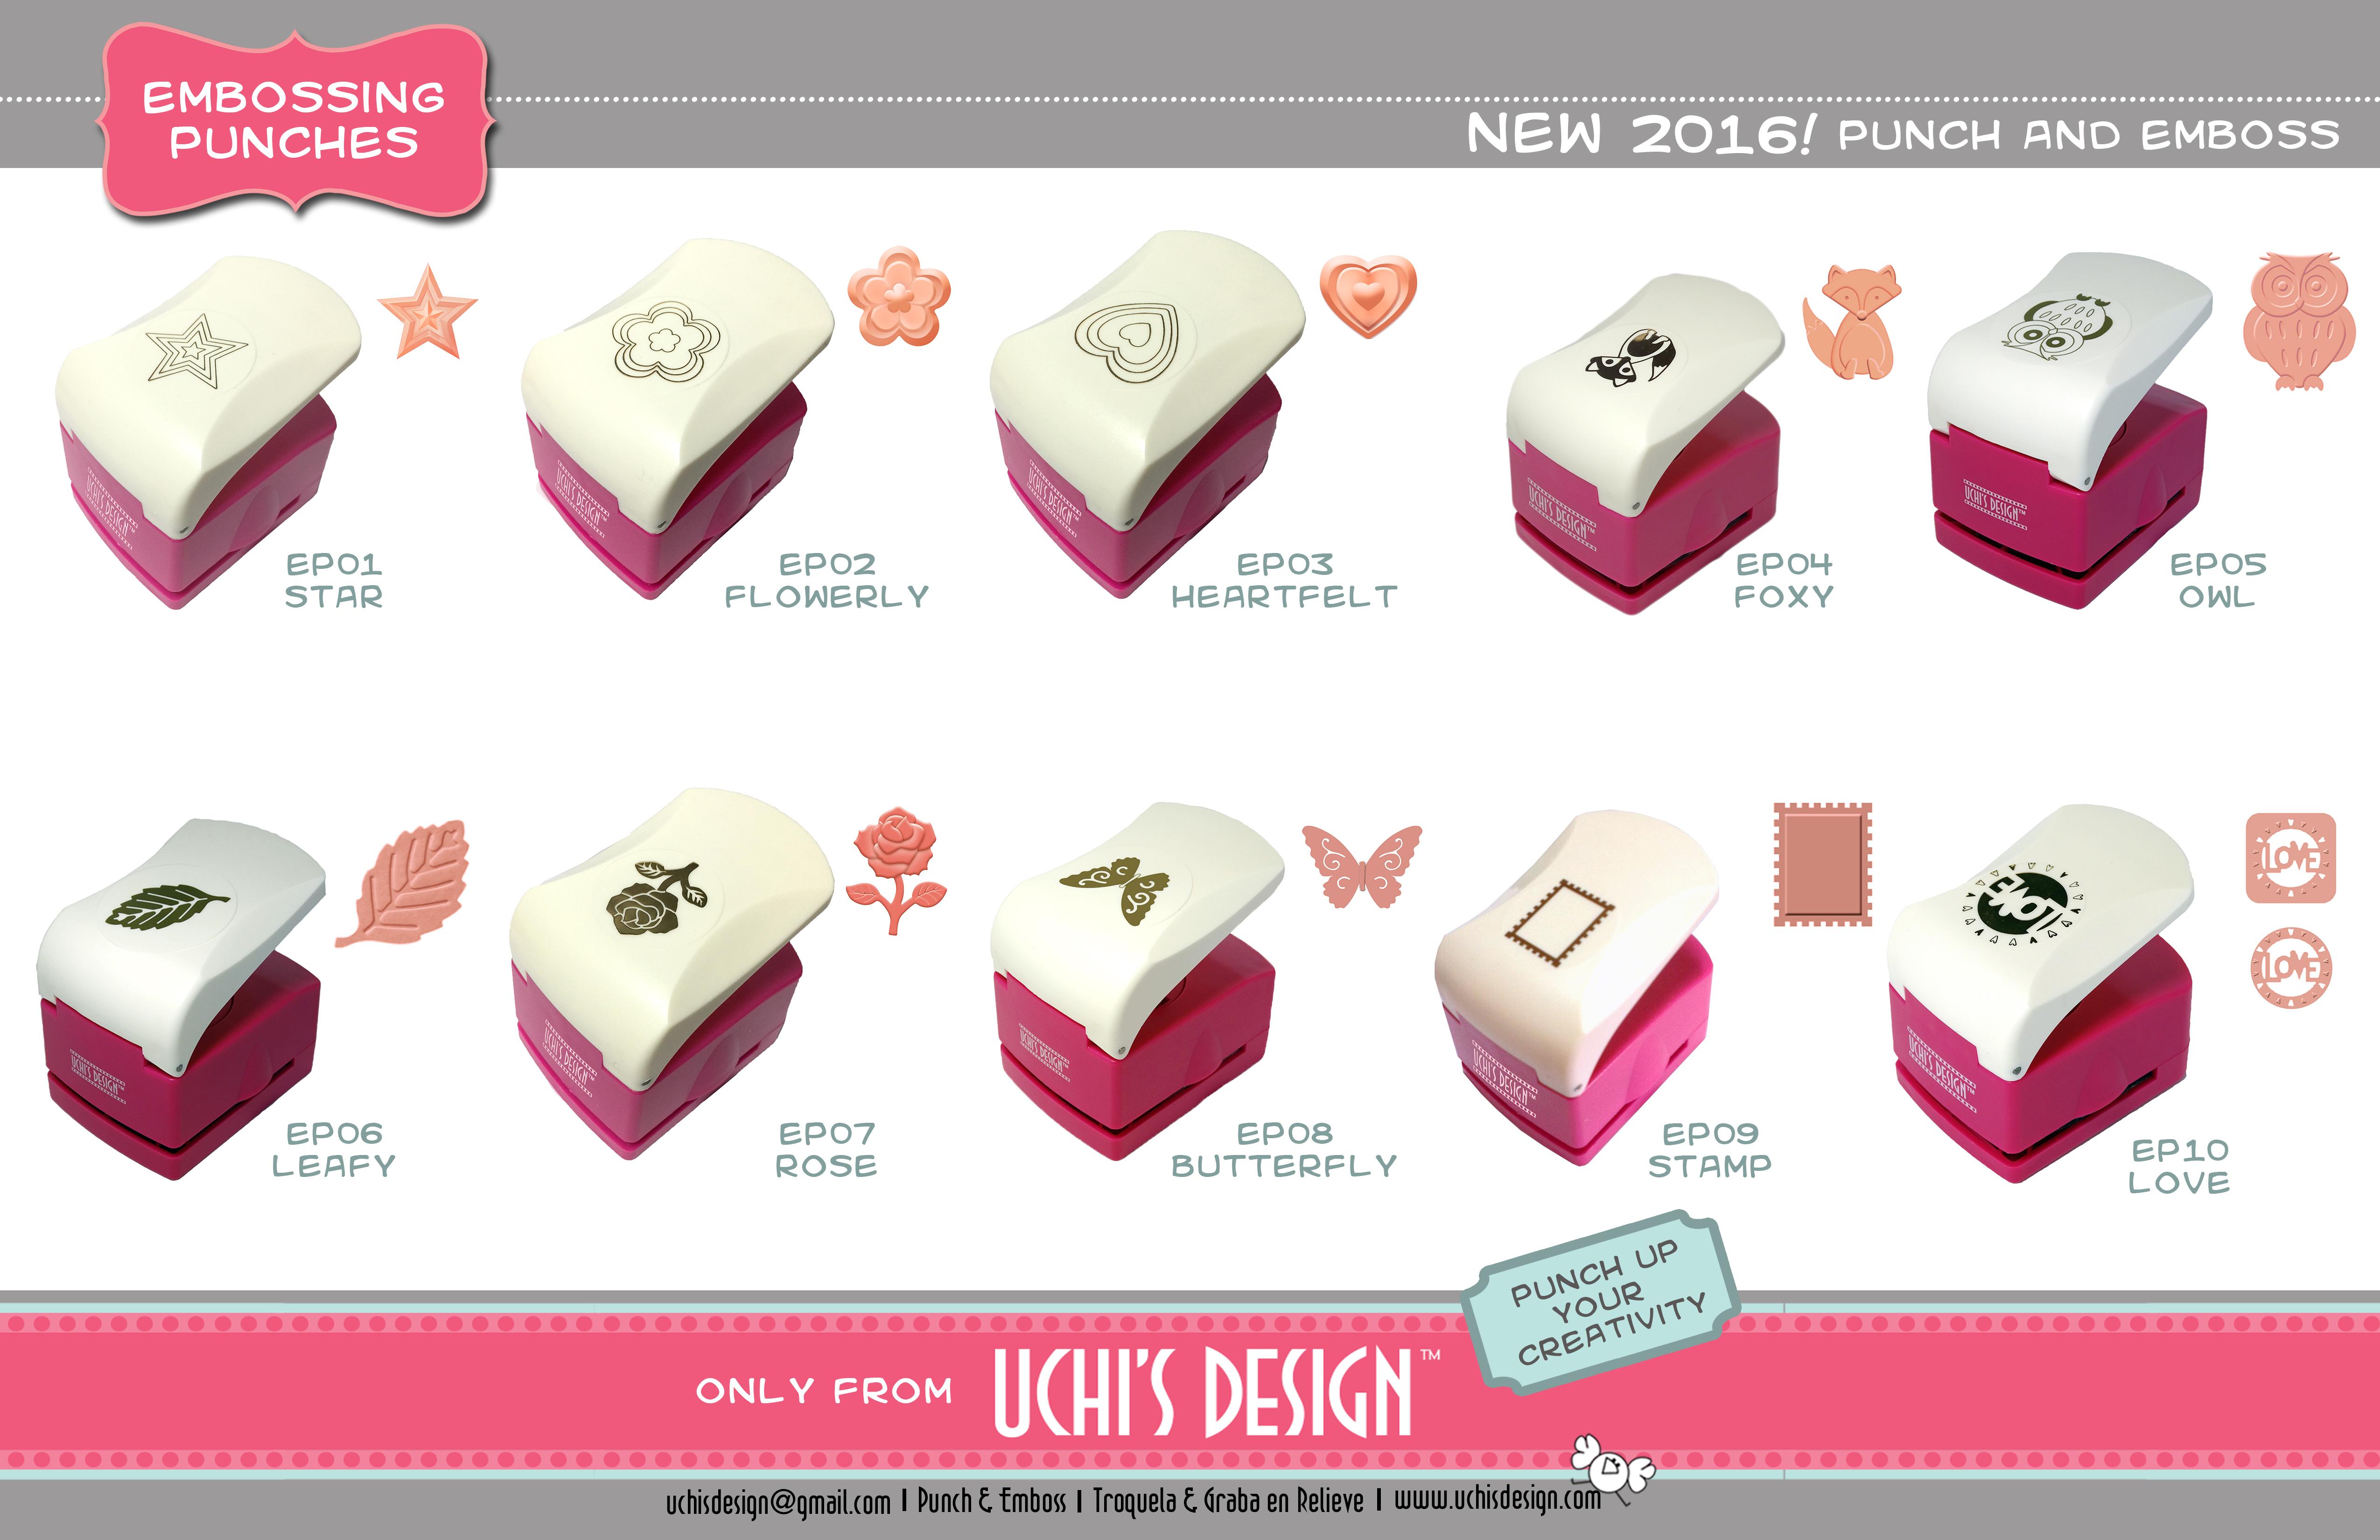 1.PUNCH CATALOG 10 designs.jpg